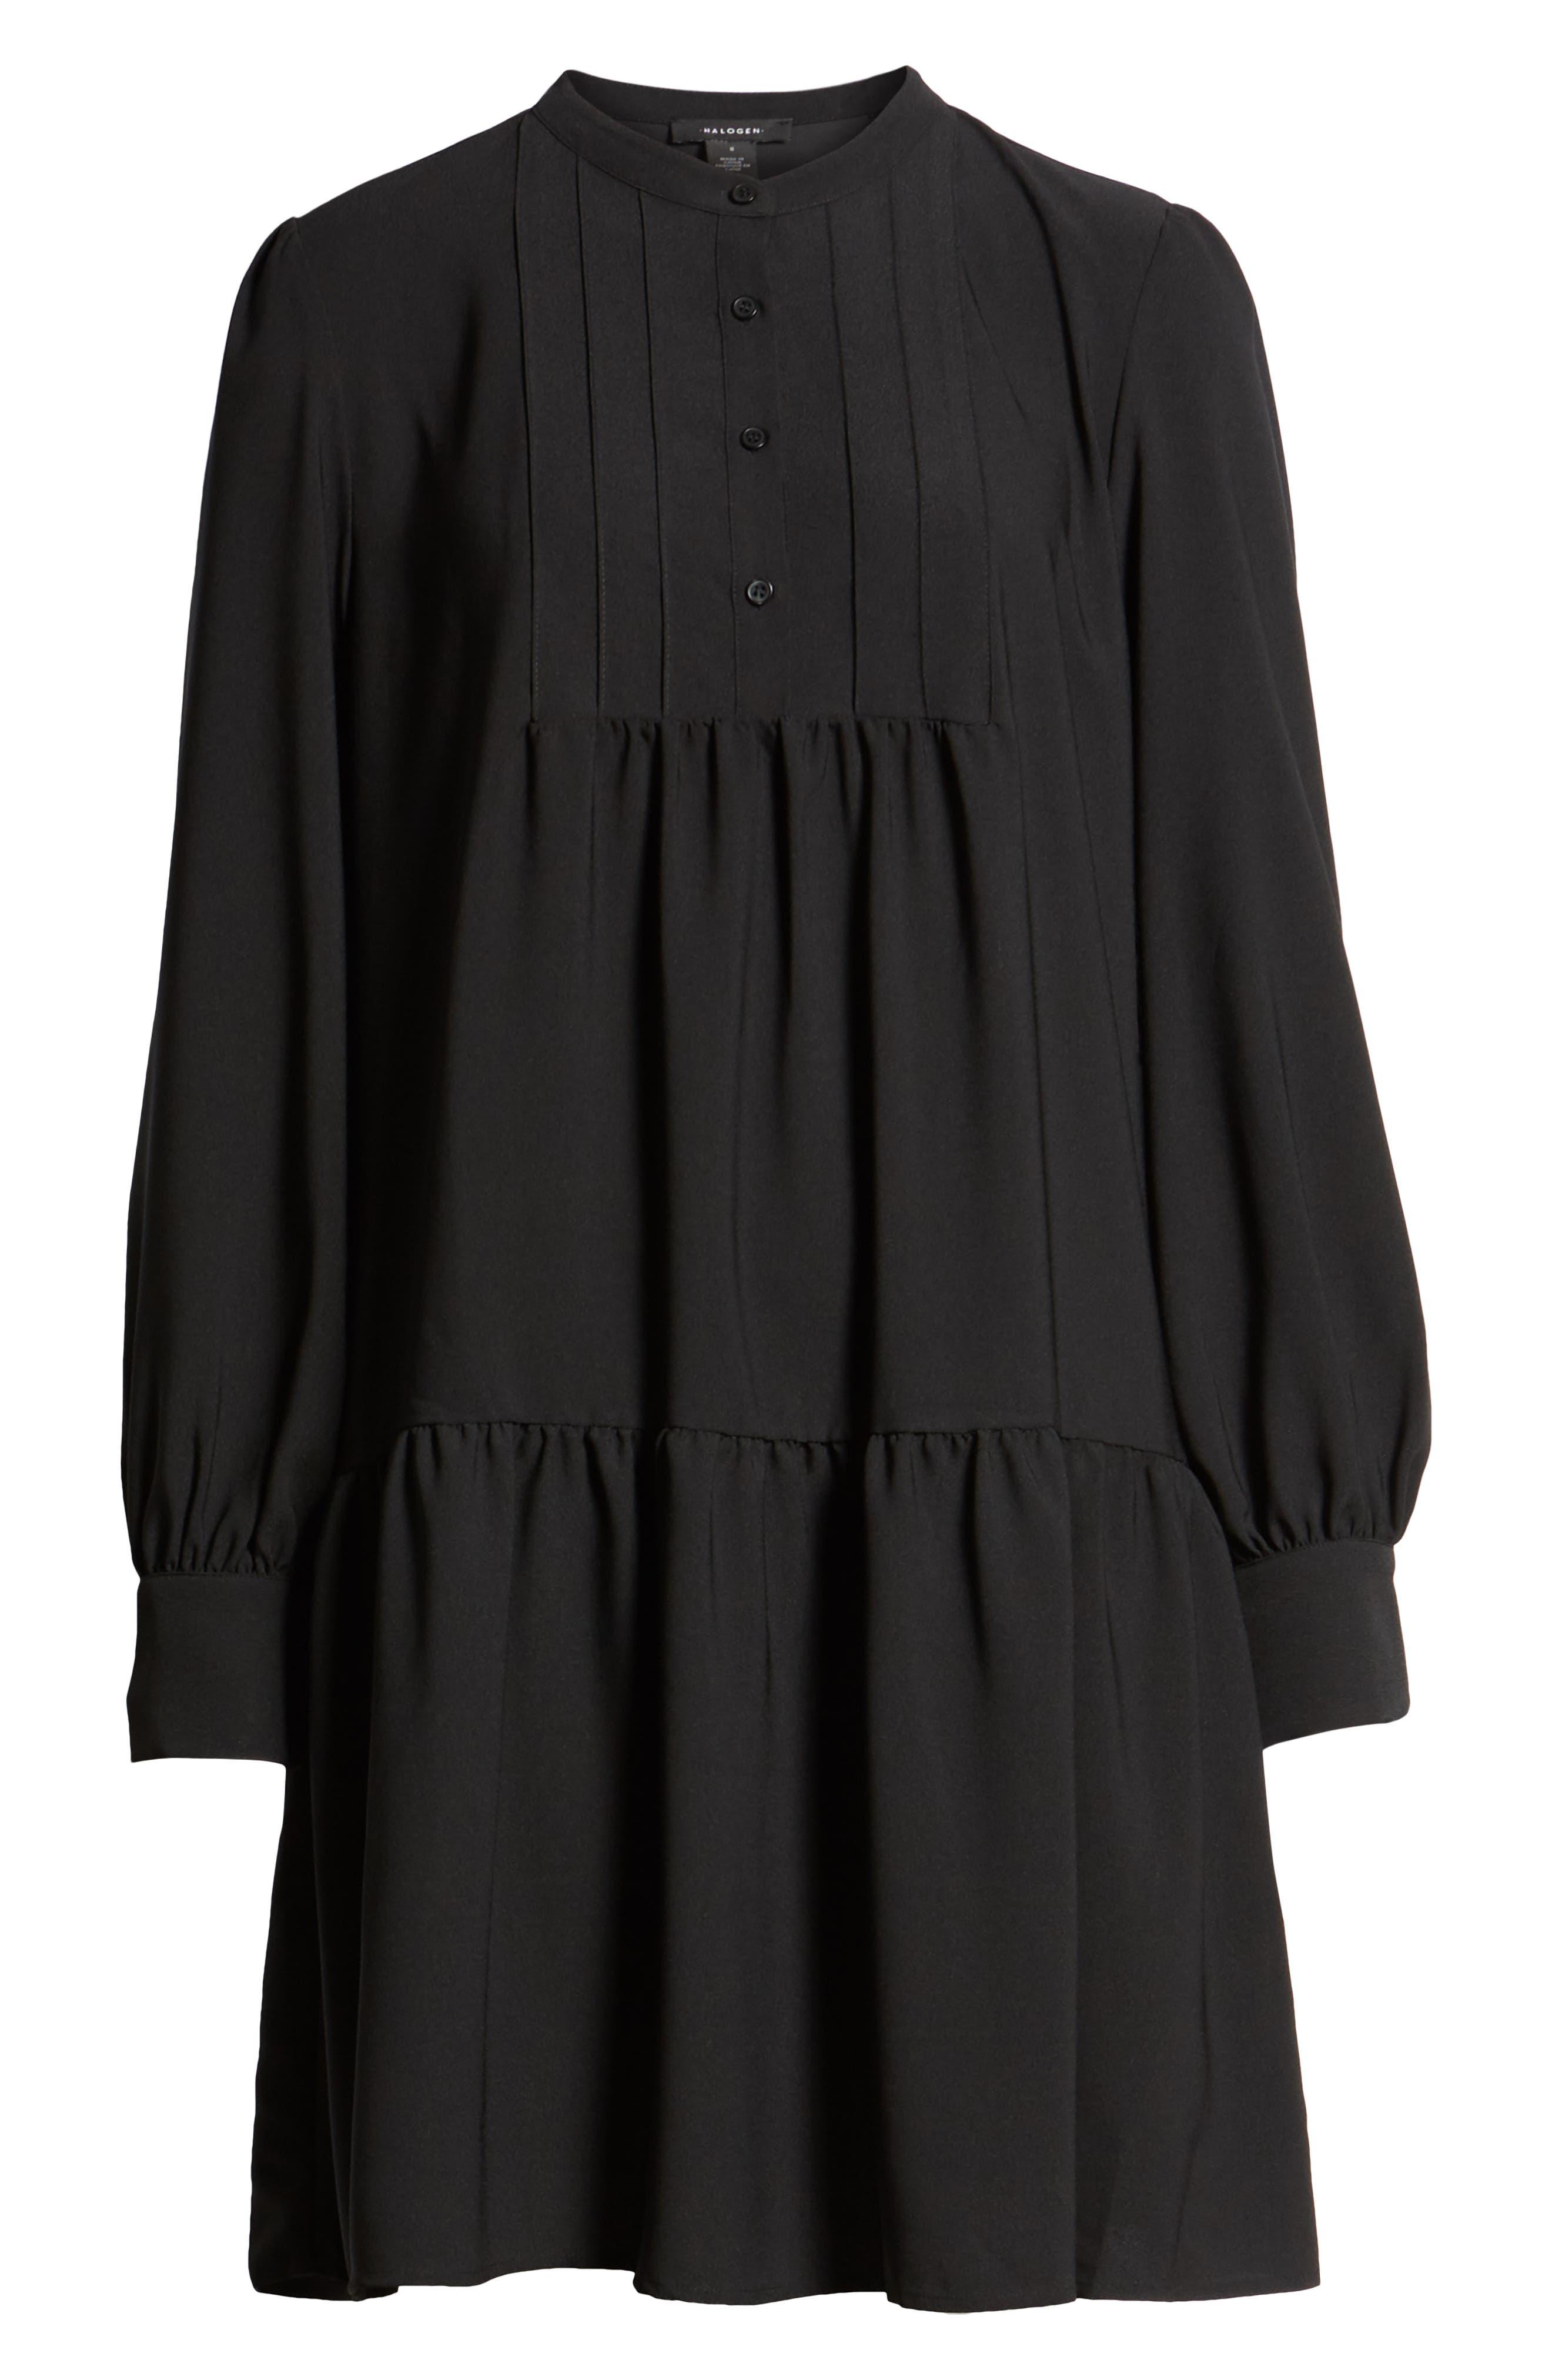 HALOGEN<SUP>®</SUP>, Pintuck Detail Shift Dress, Alternate thumbnail 7, color, BLACK